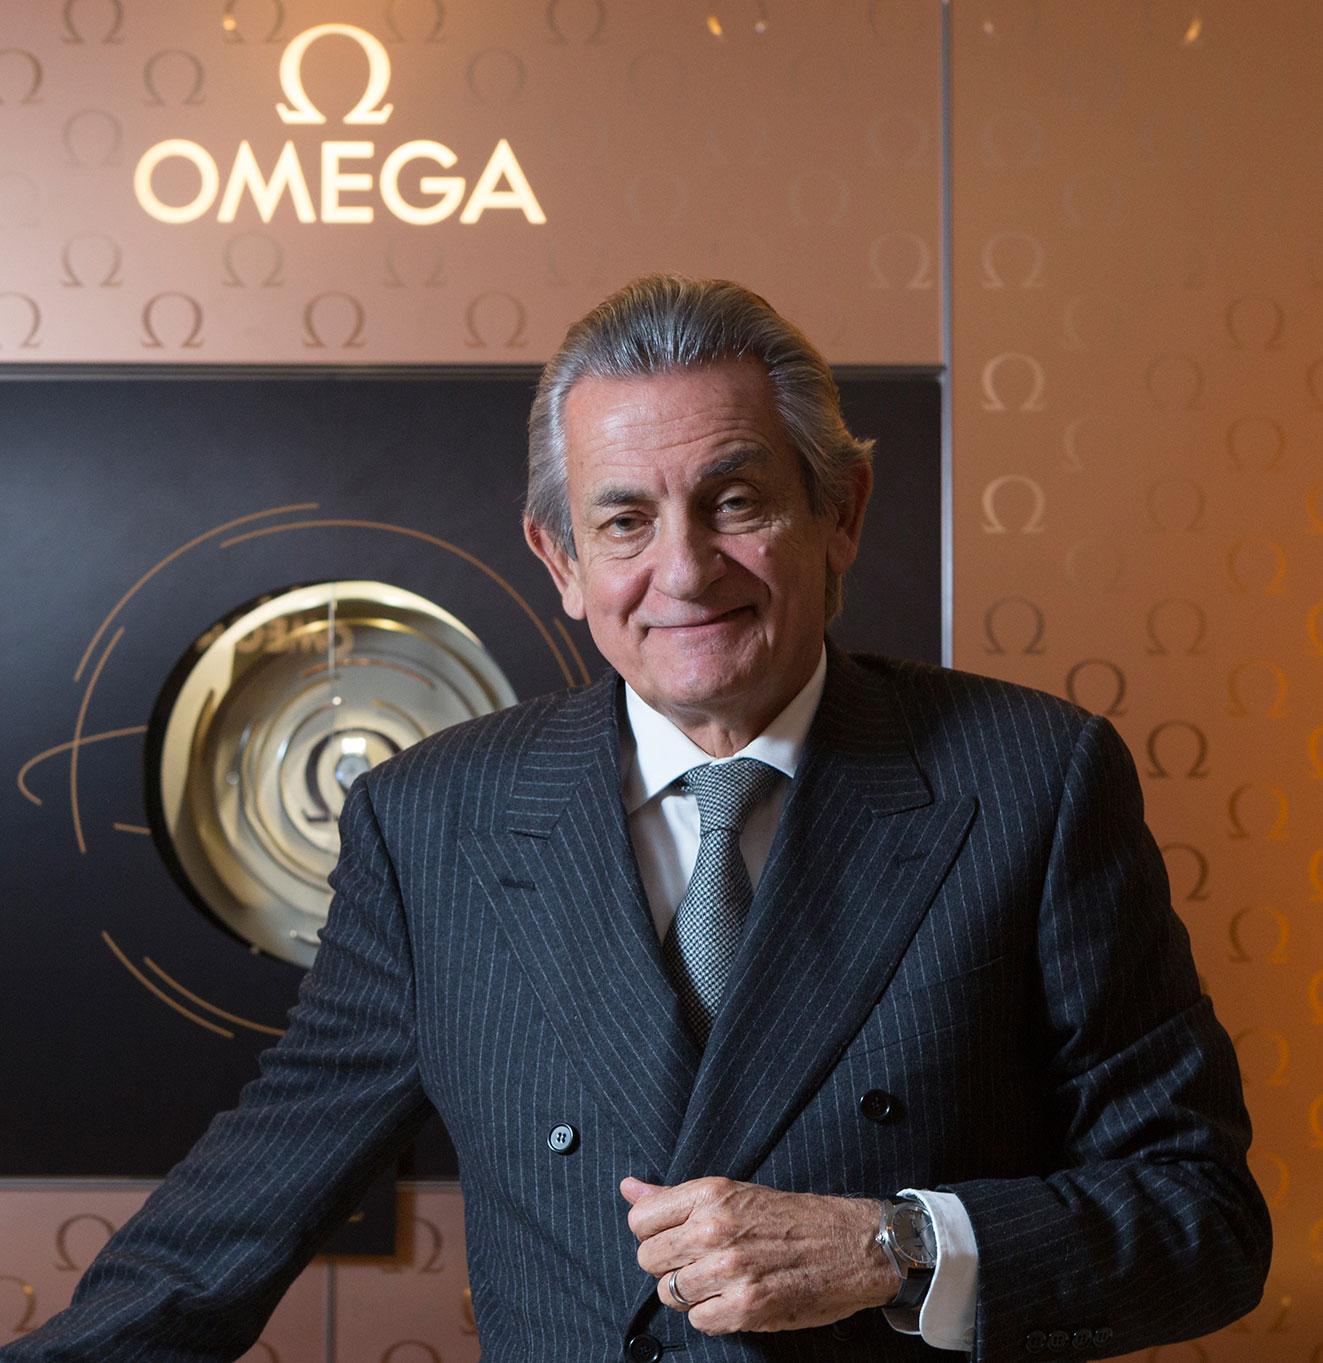 Stephen Urquhart Omega CEO portrait